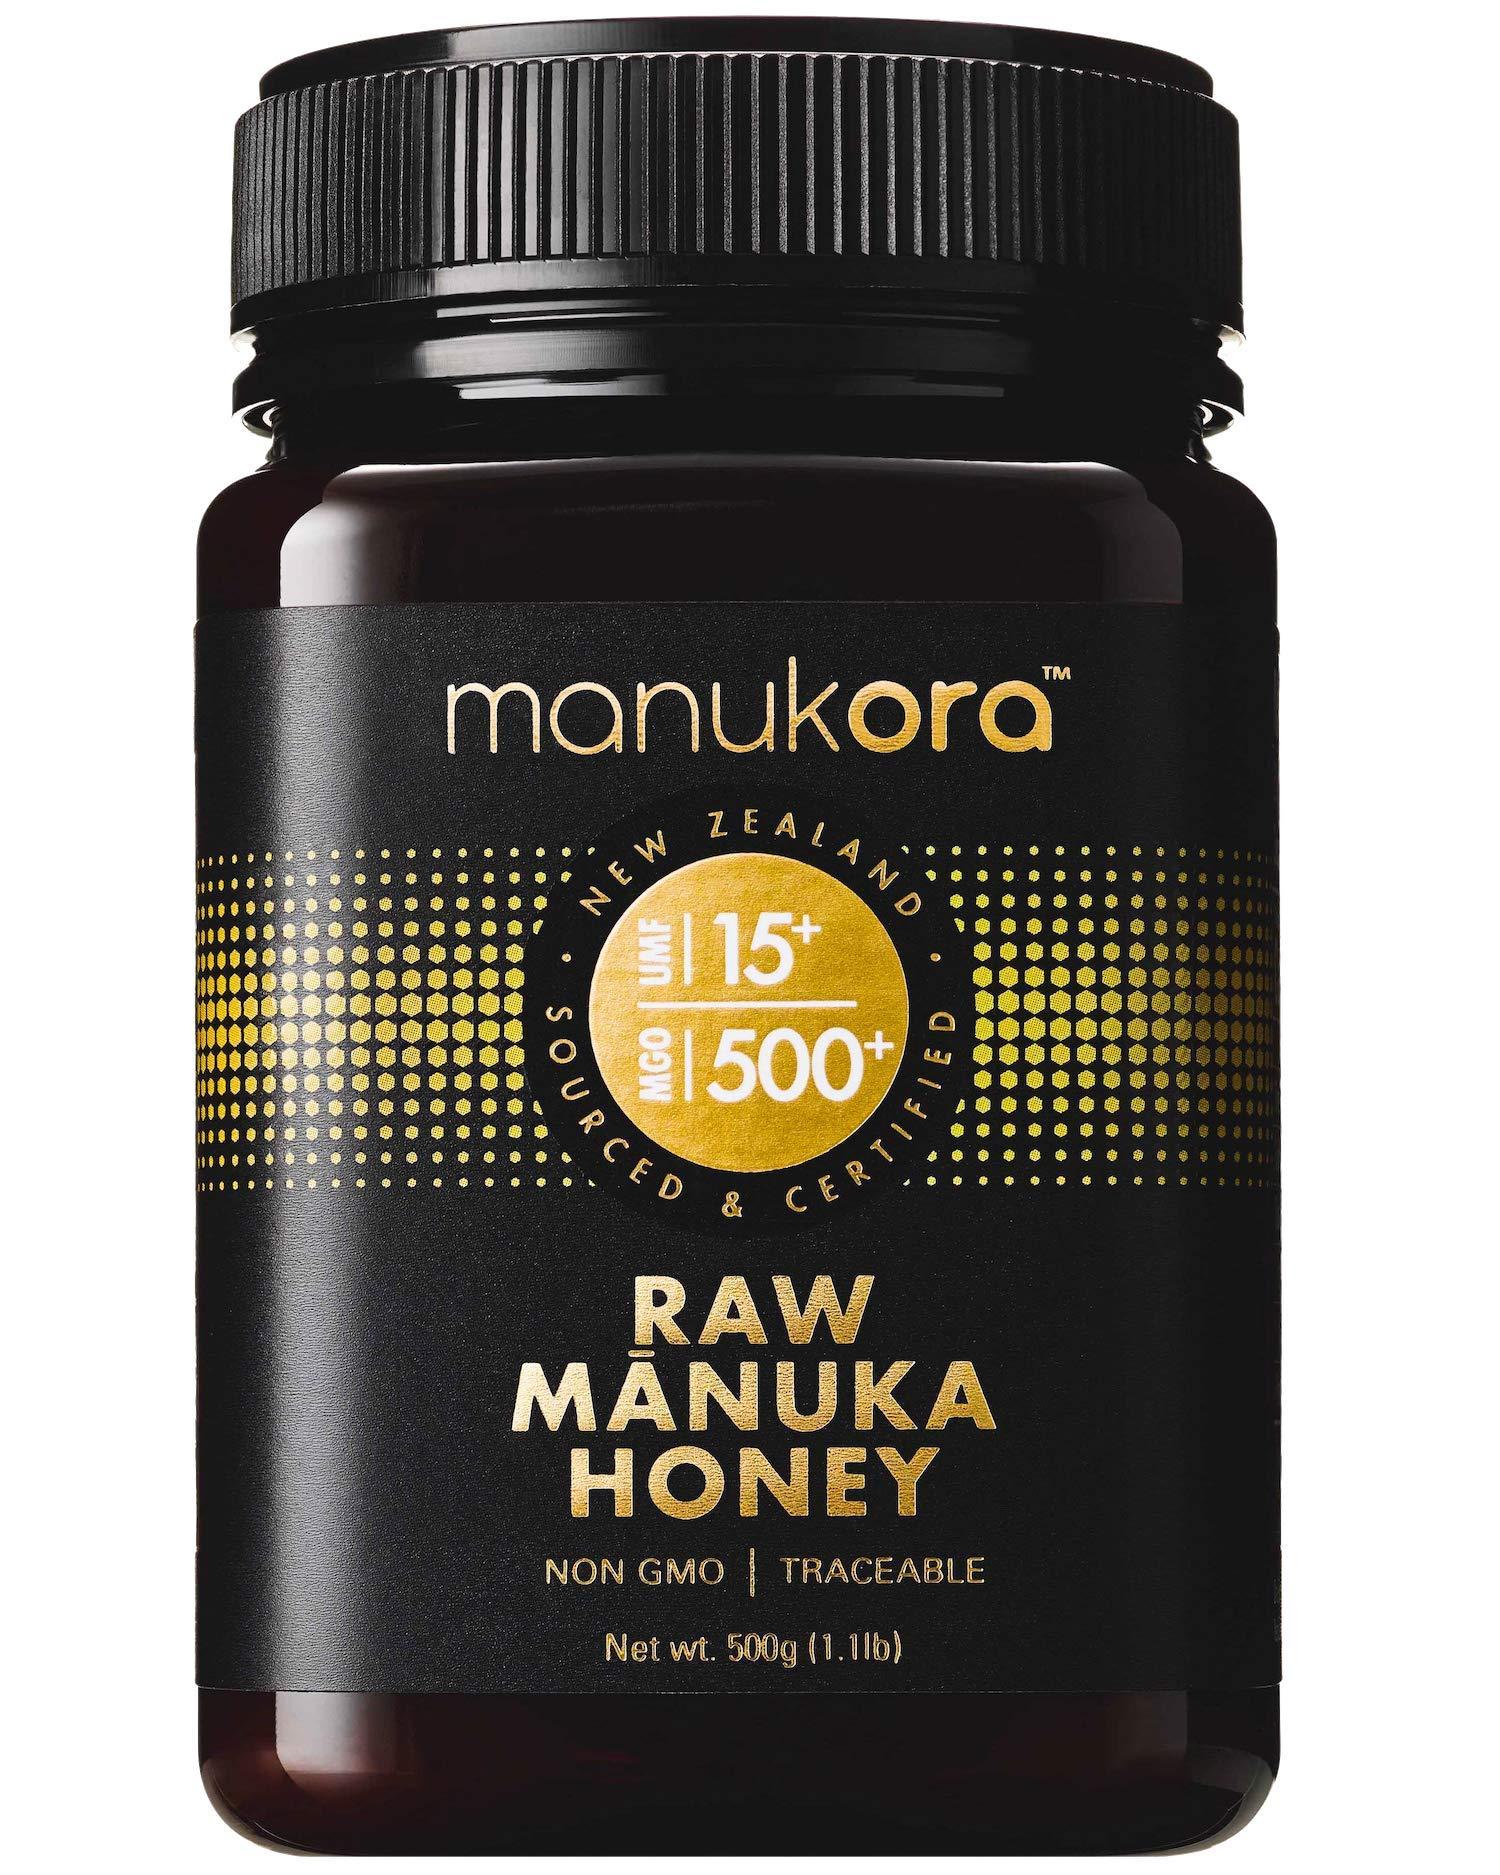 Manukora UMF 15+/MGO 500+ Raw Mānuka Honey (500g/1.1lb) Authentic Non-GMO New Zealand Honey, UMF & MGO Certified, Traceable from Hive to Hand